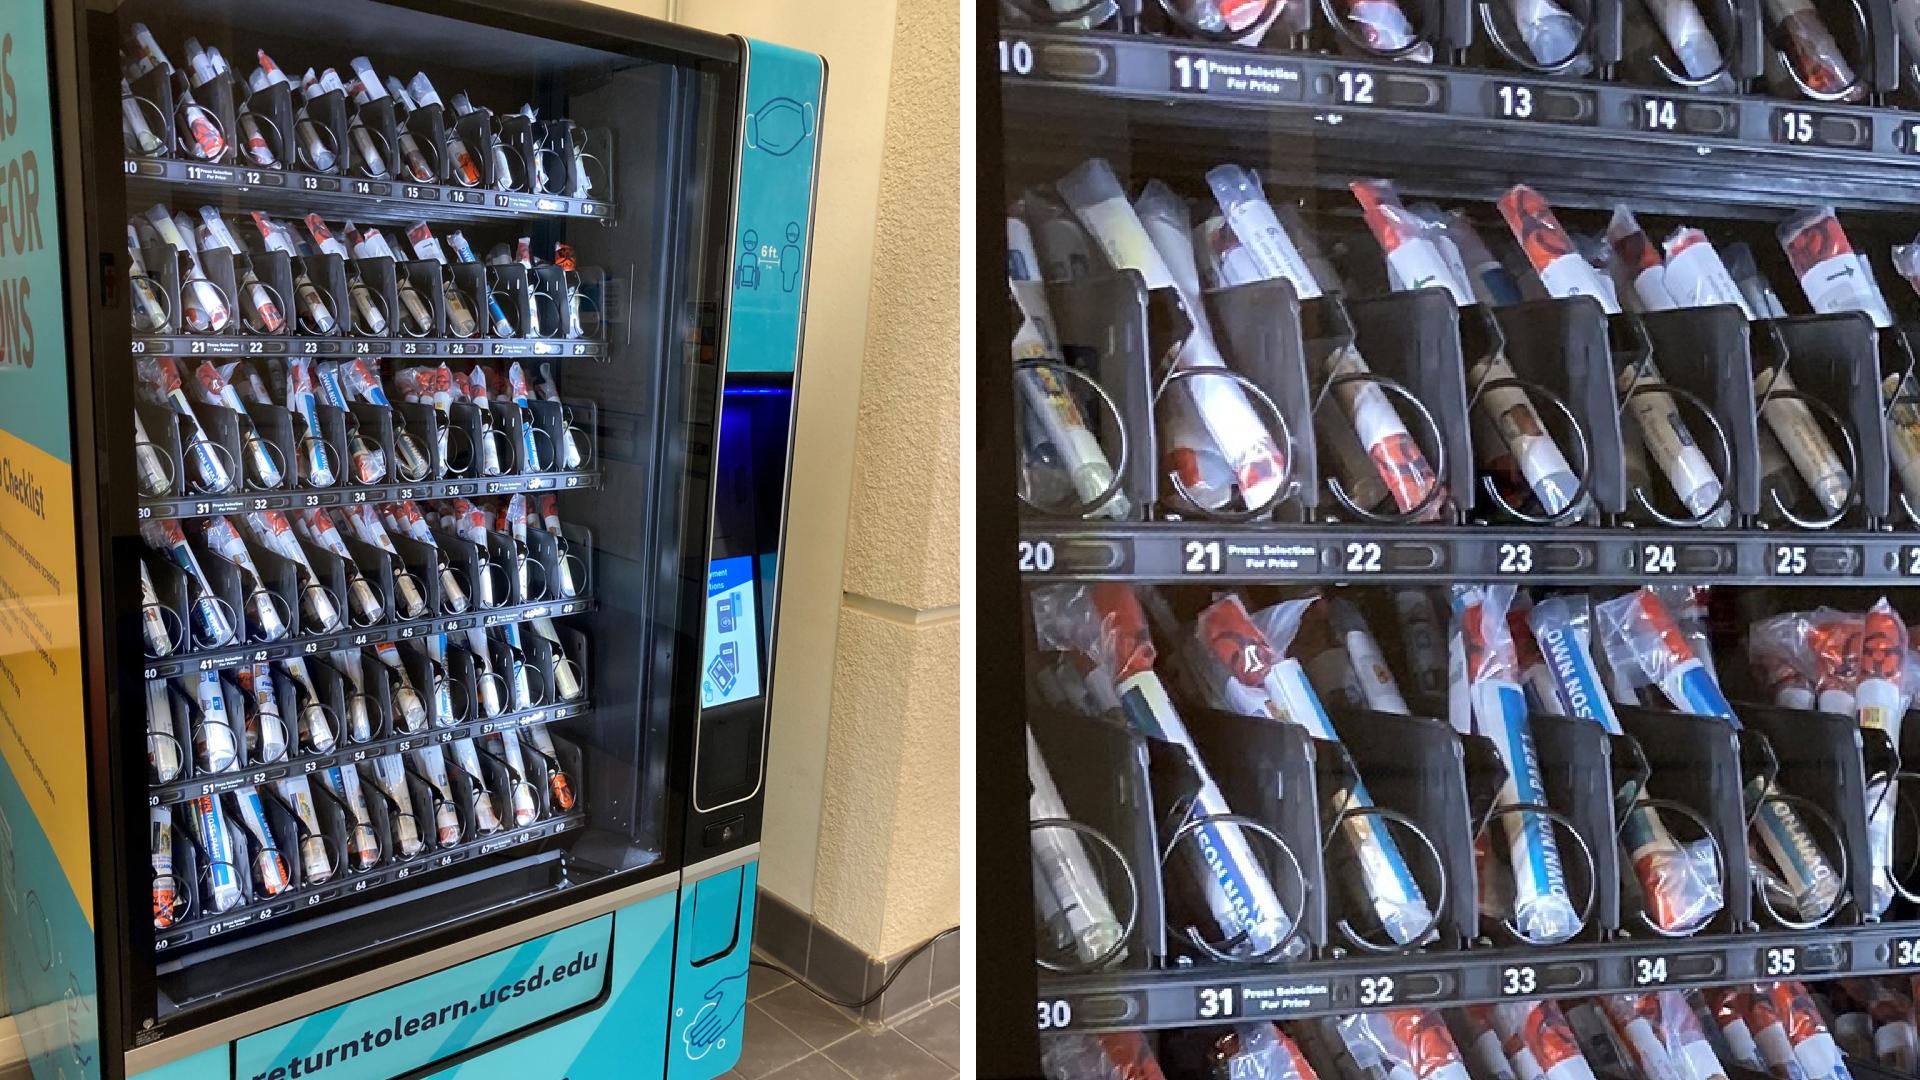 UC San Diego shared this image of a vending machine that dispenses coronavirus test kits.